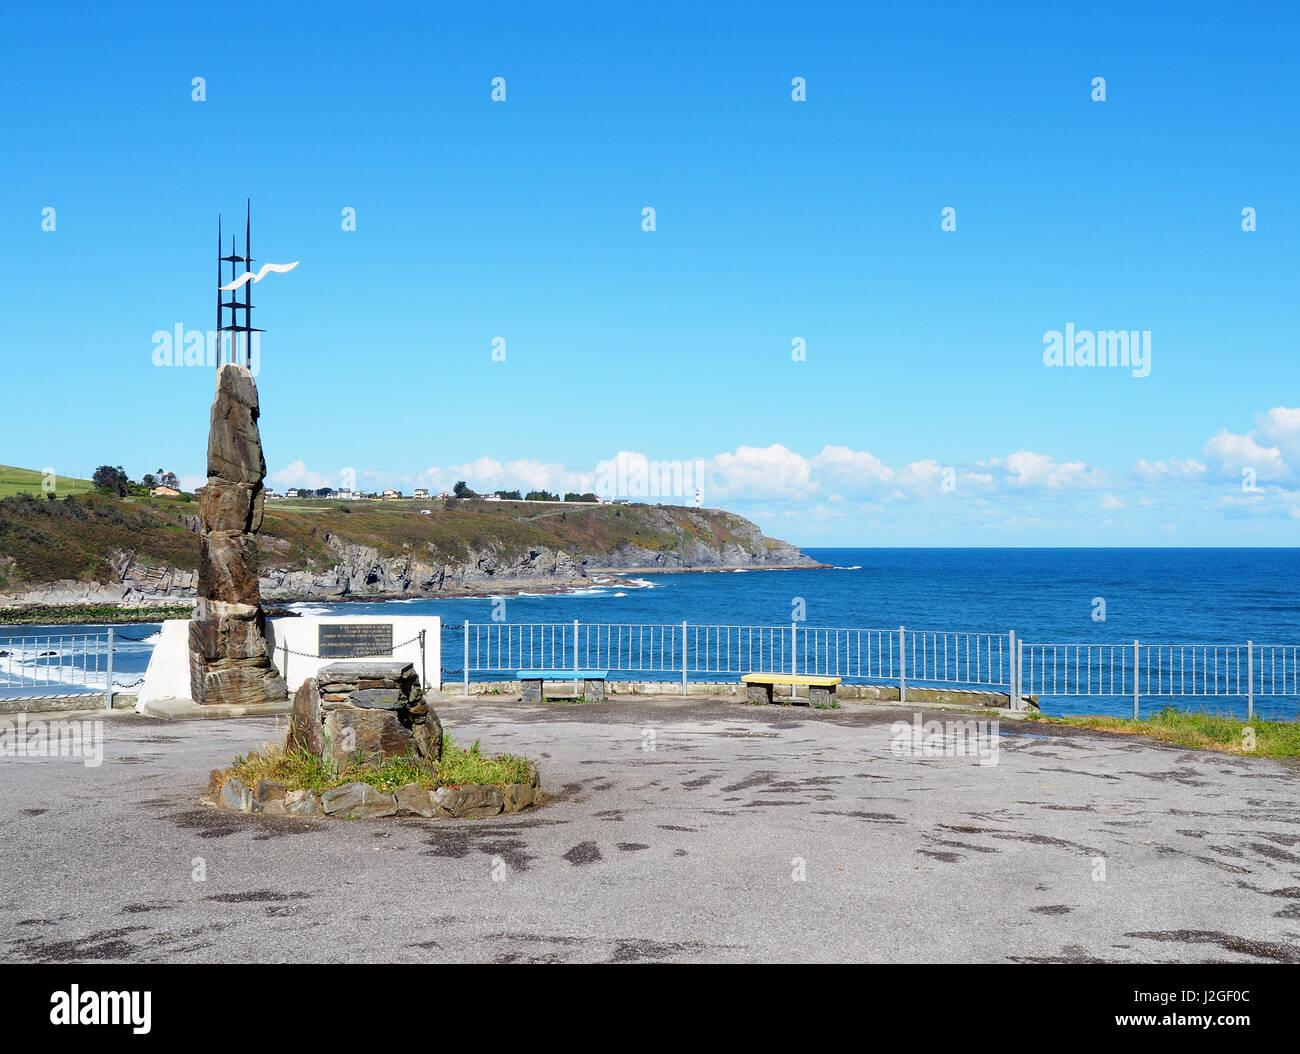 Emigrant monument in Navia, Spain - Stock Image